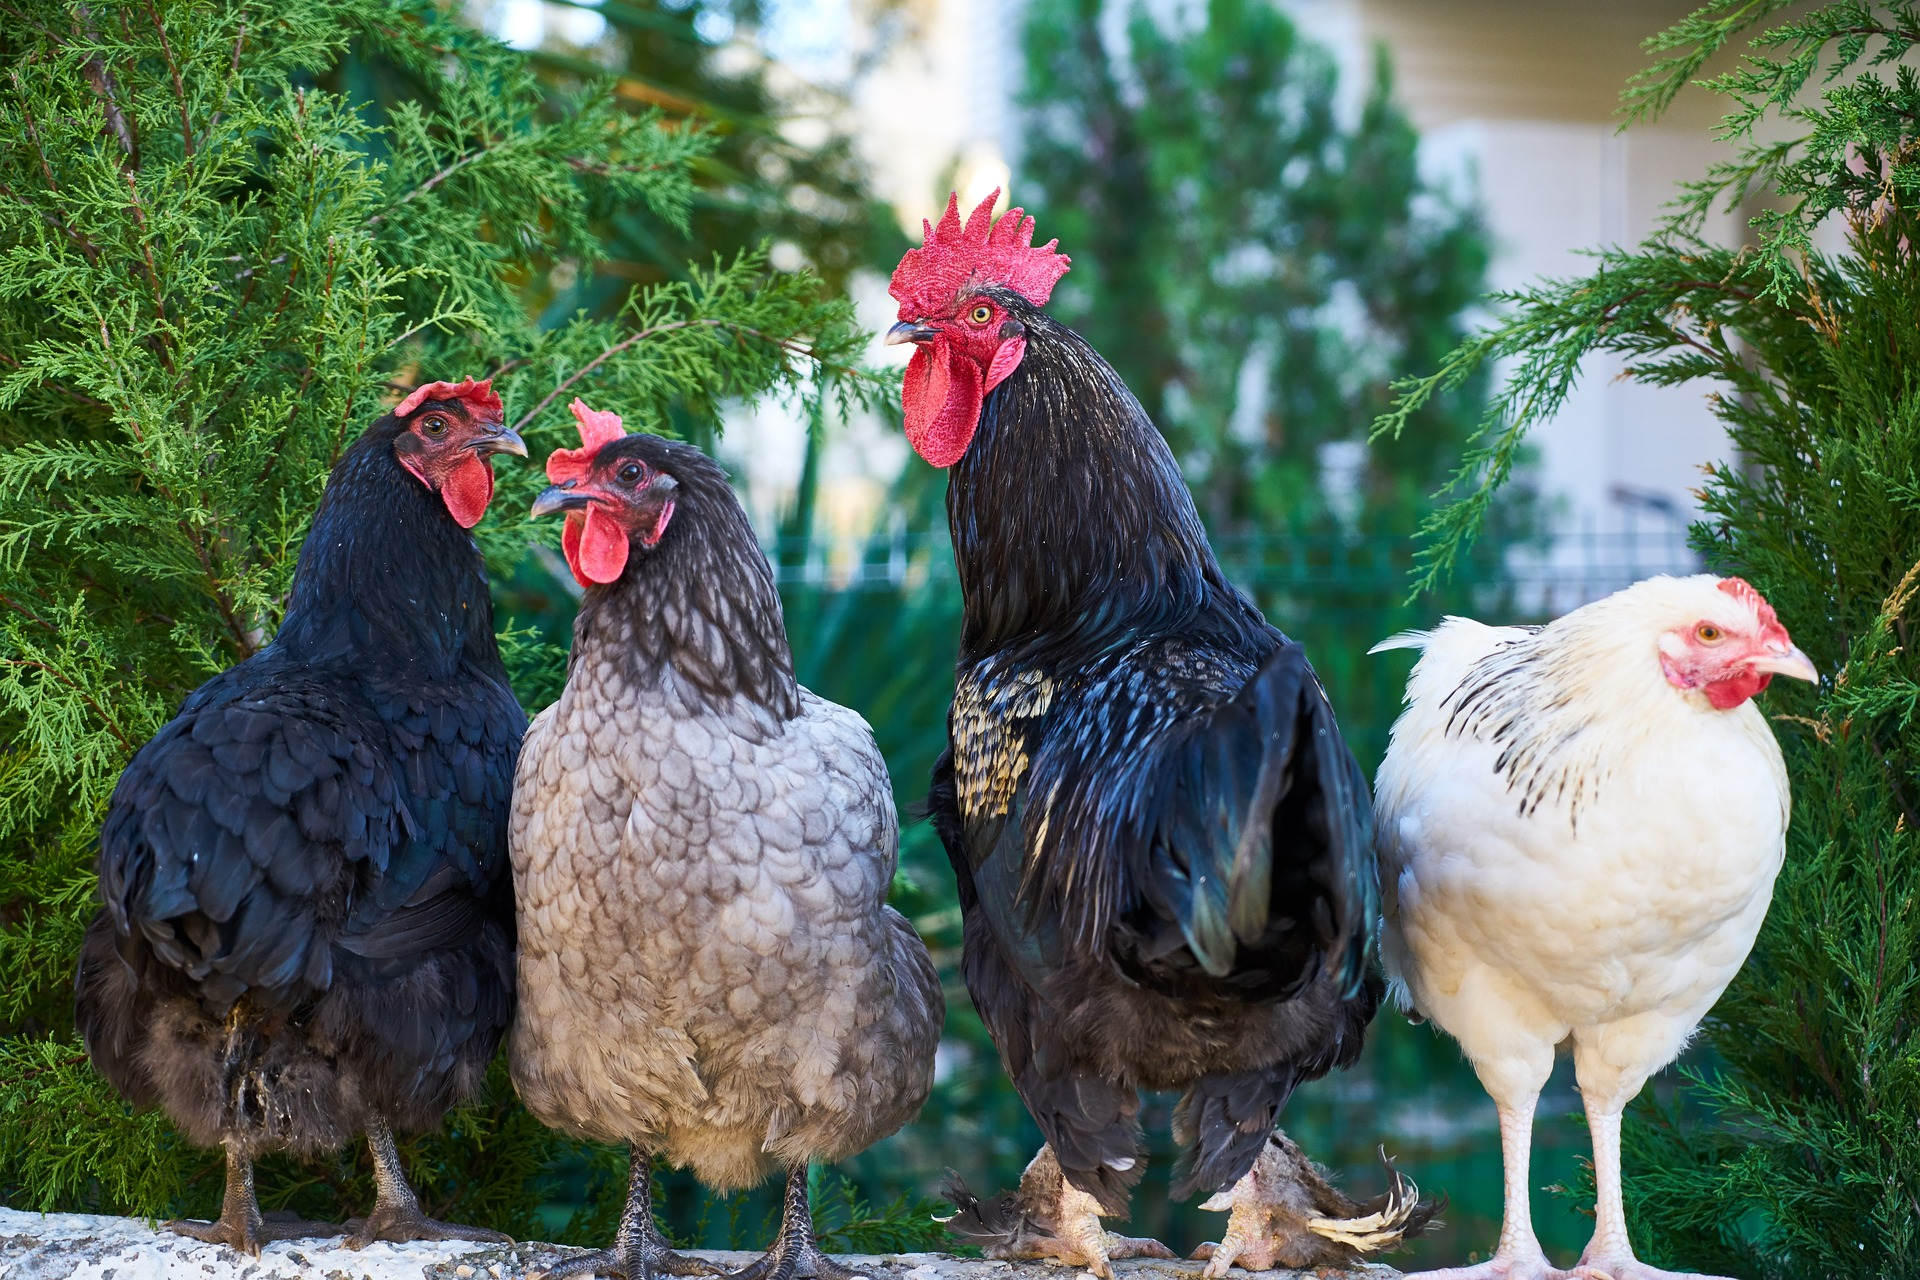 chicken-3919446_1920.jpg